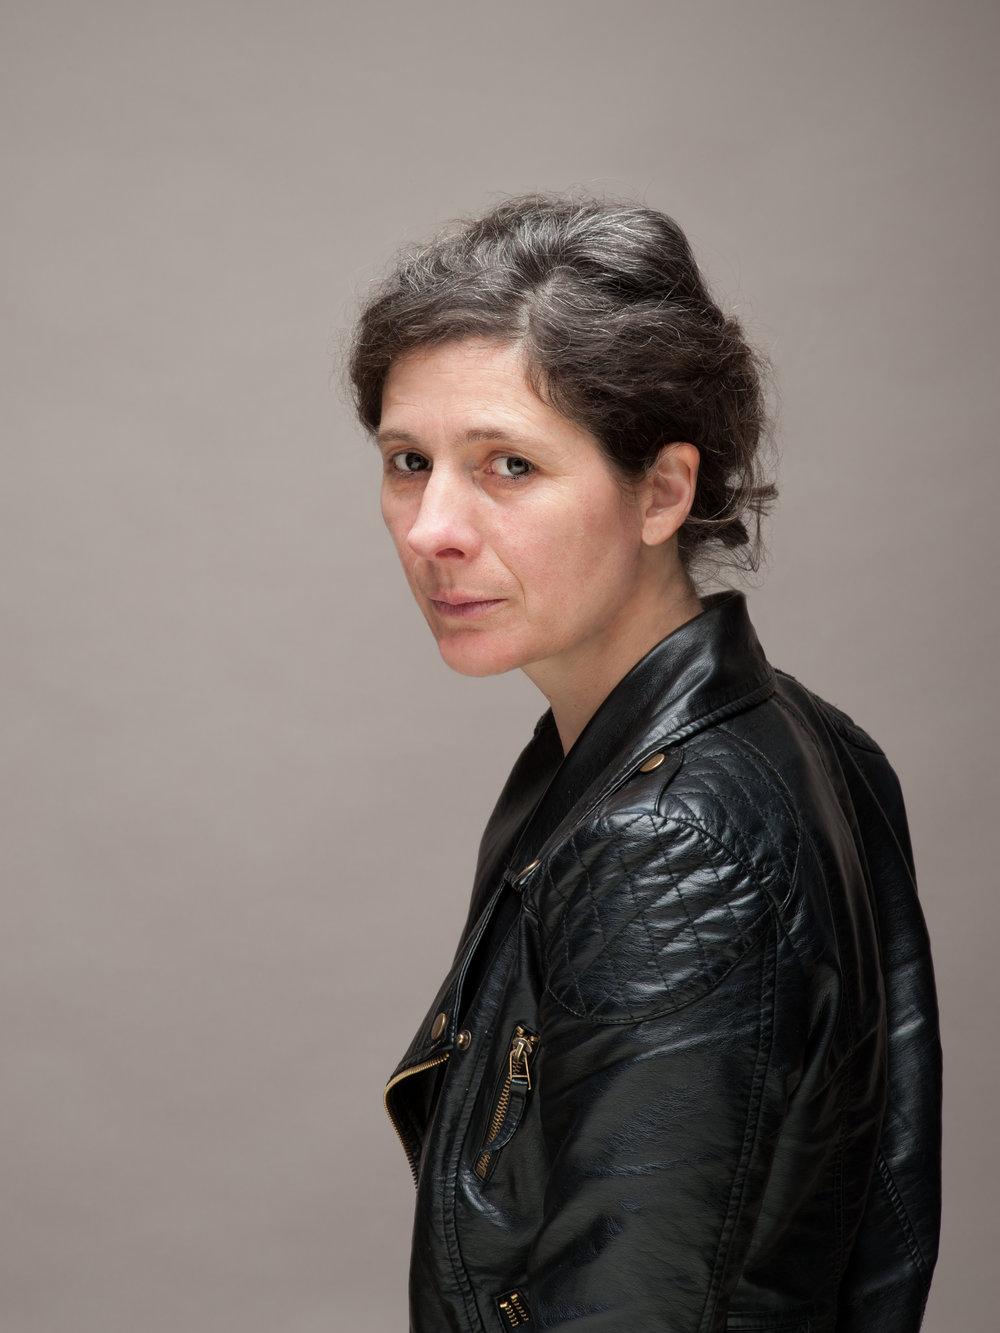 Birgit portrait 2012.jpg